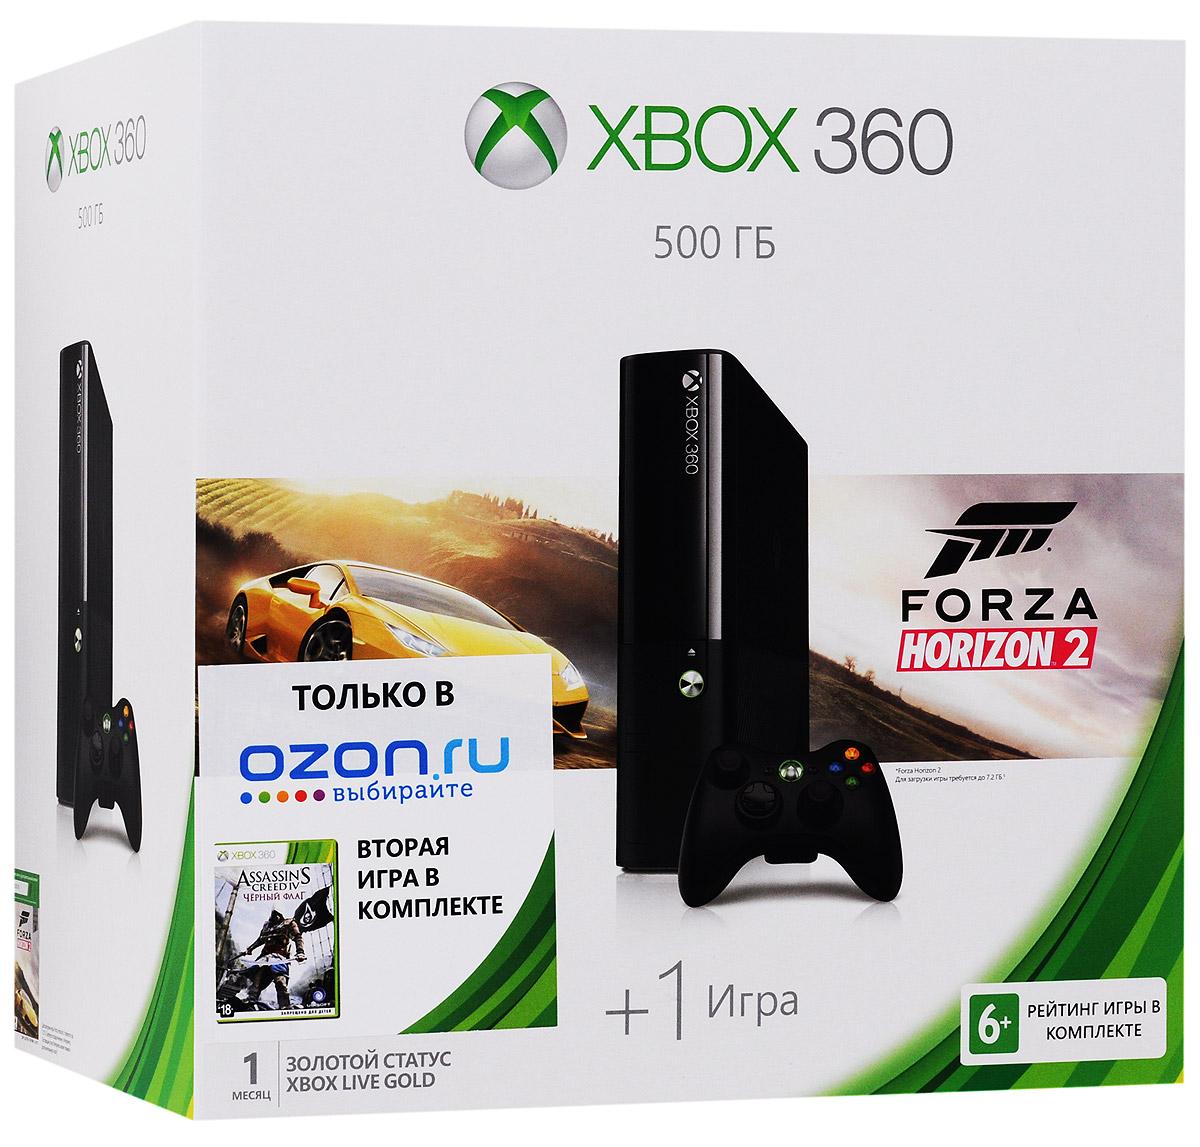 Игровая приставка Microsoft Xbox 360 (500 ГБ) + Forza Horizon 2 + Assassin's Creed 4: Черный флаг